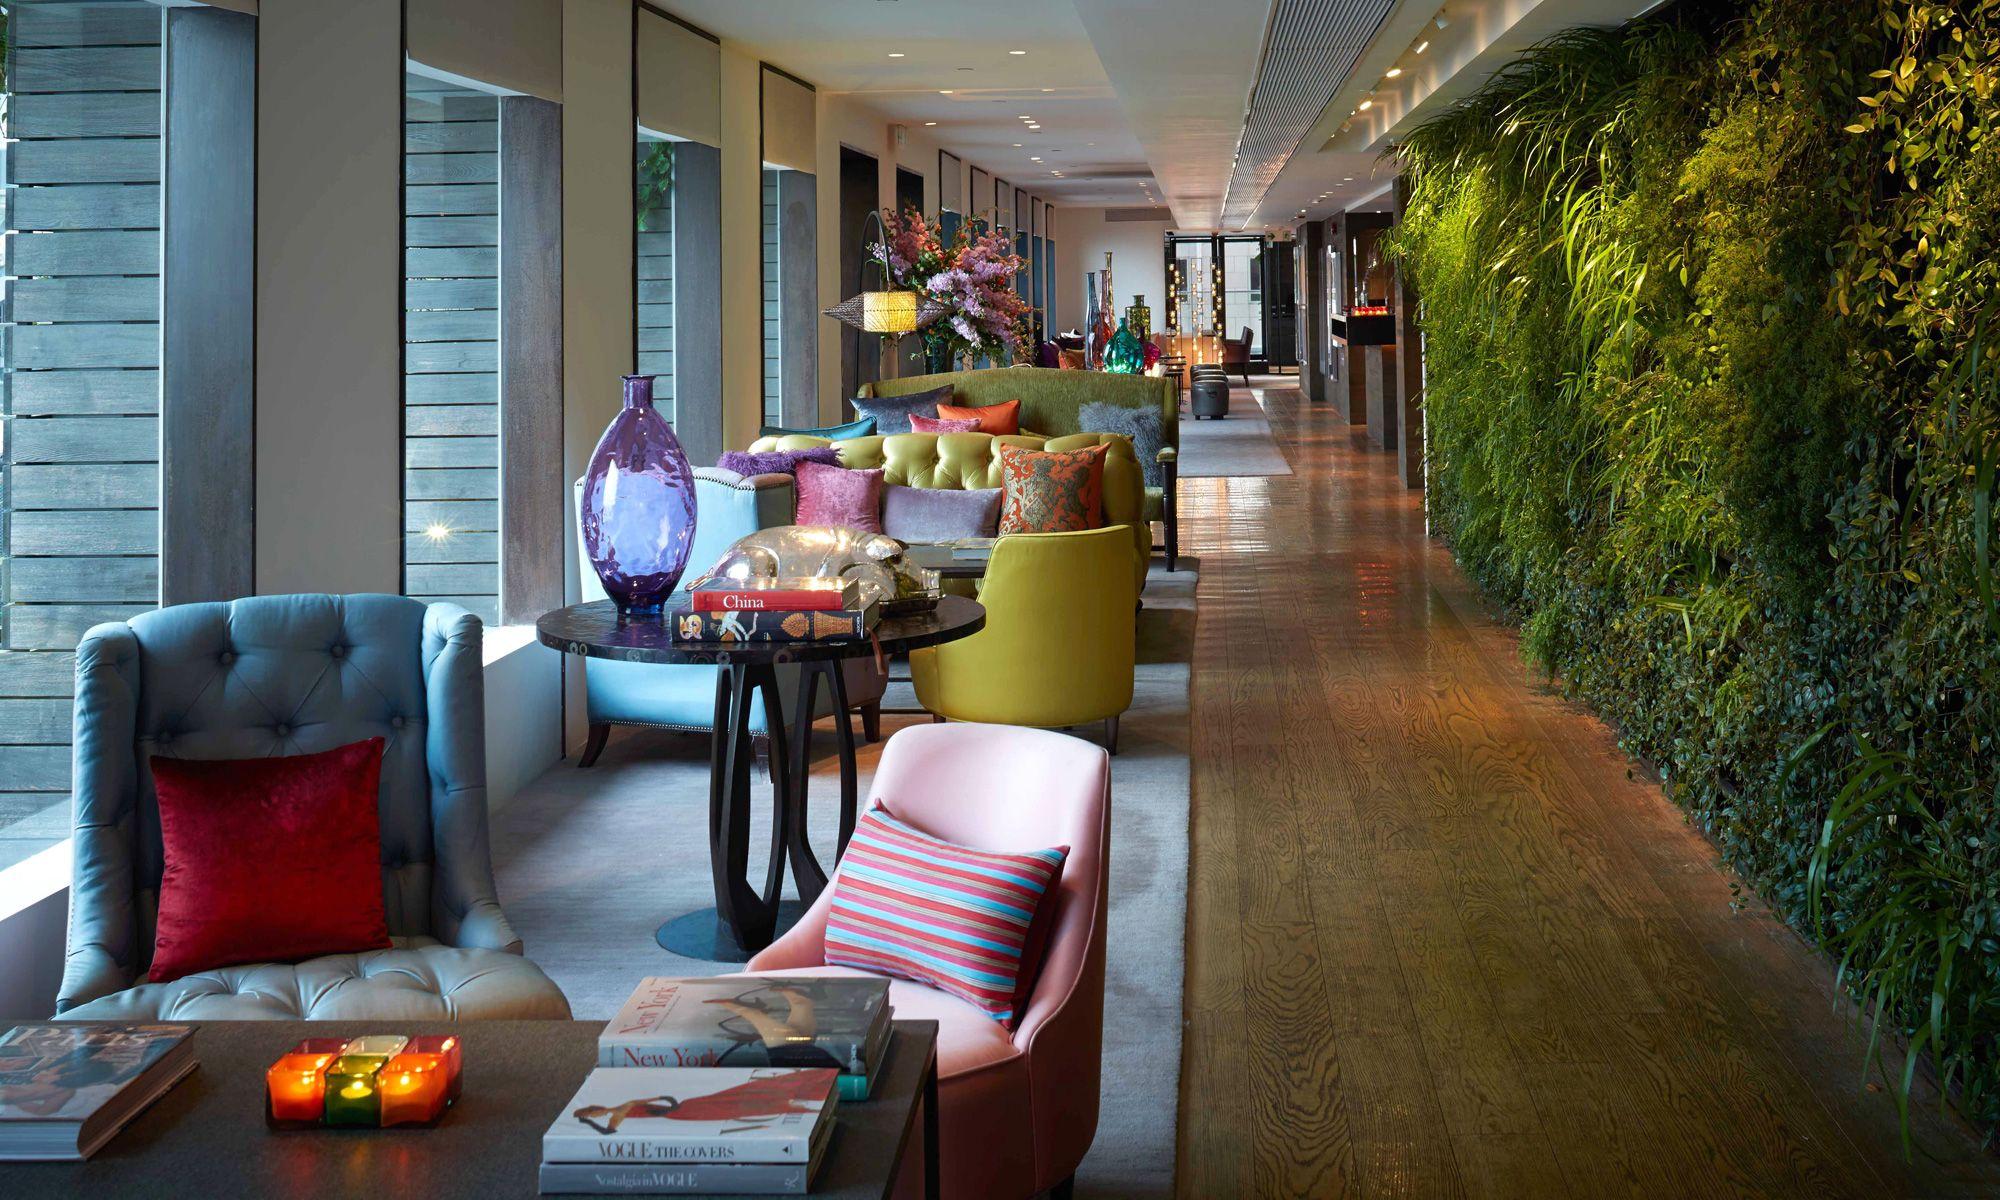 EAT & DRINK_ BAR & CLUB_  SEVVA.  #Rooftop #Interiors #Pastry #Foodies #Clubbing #View   https://www.sevva.hk